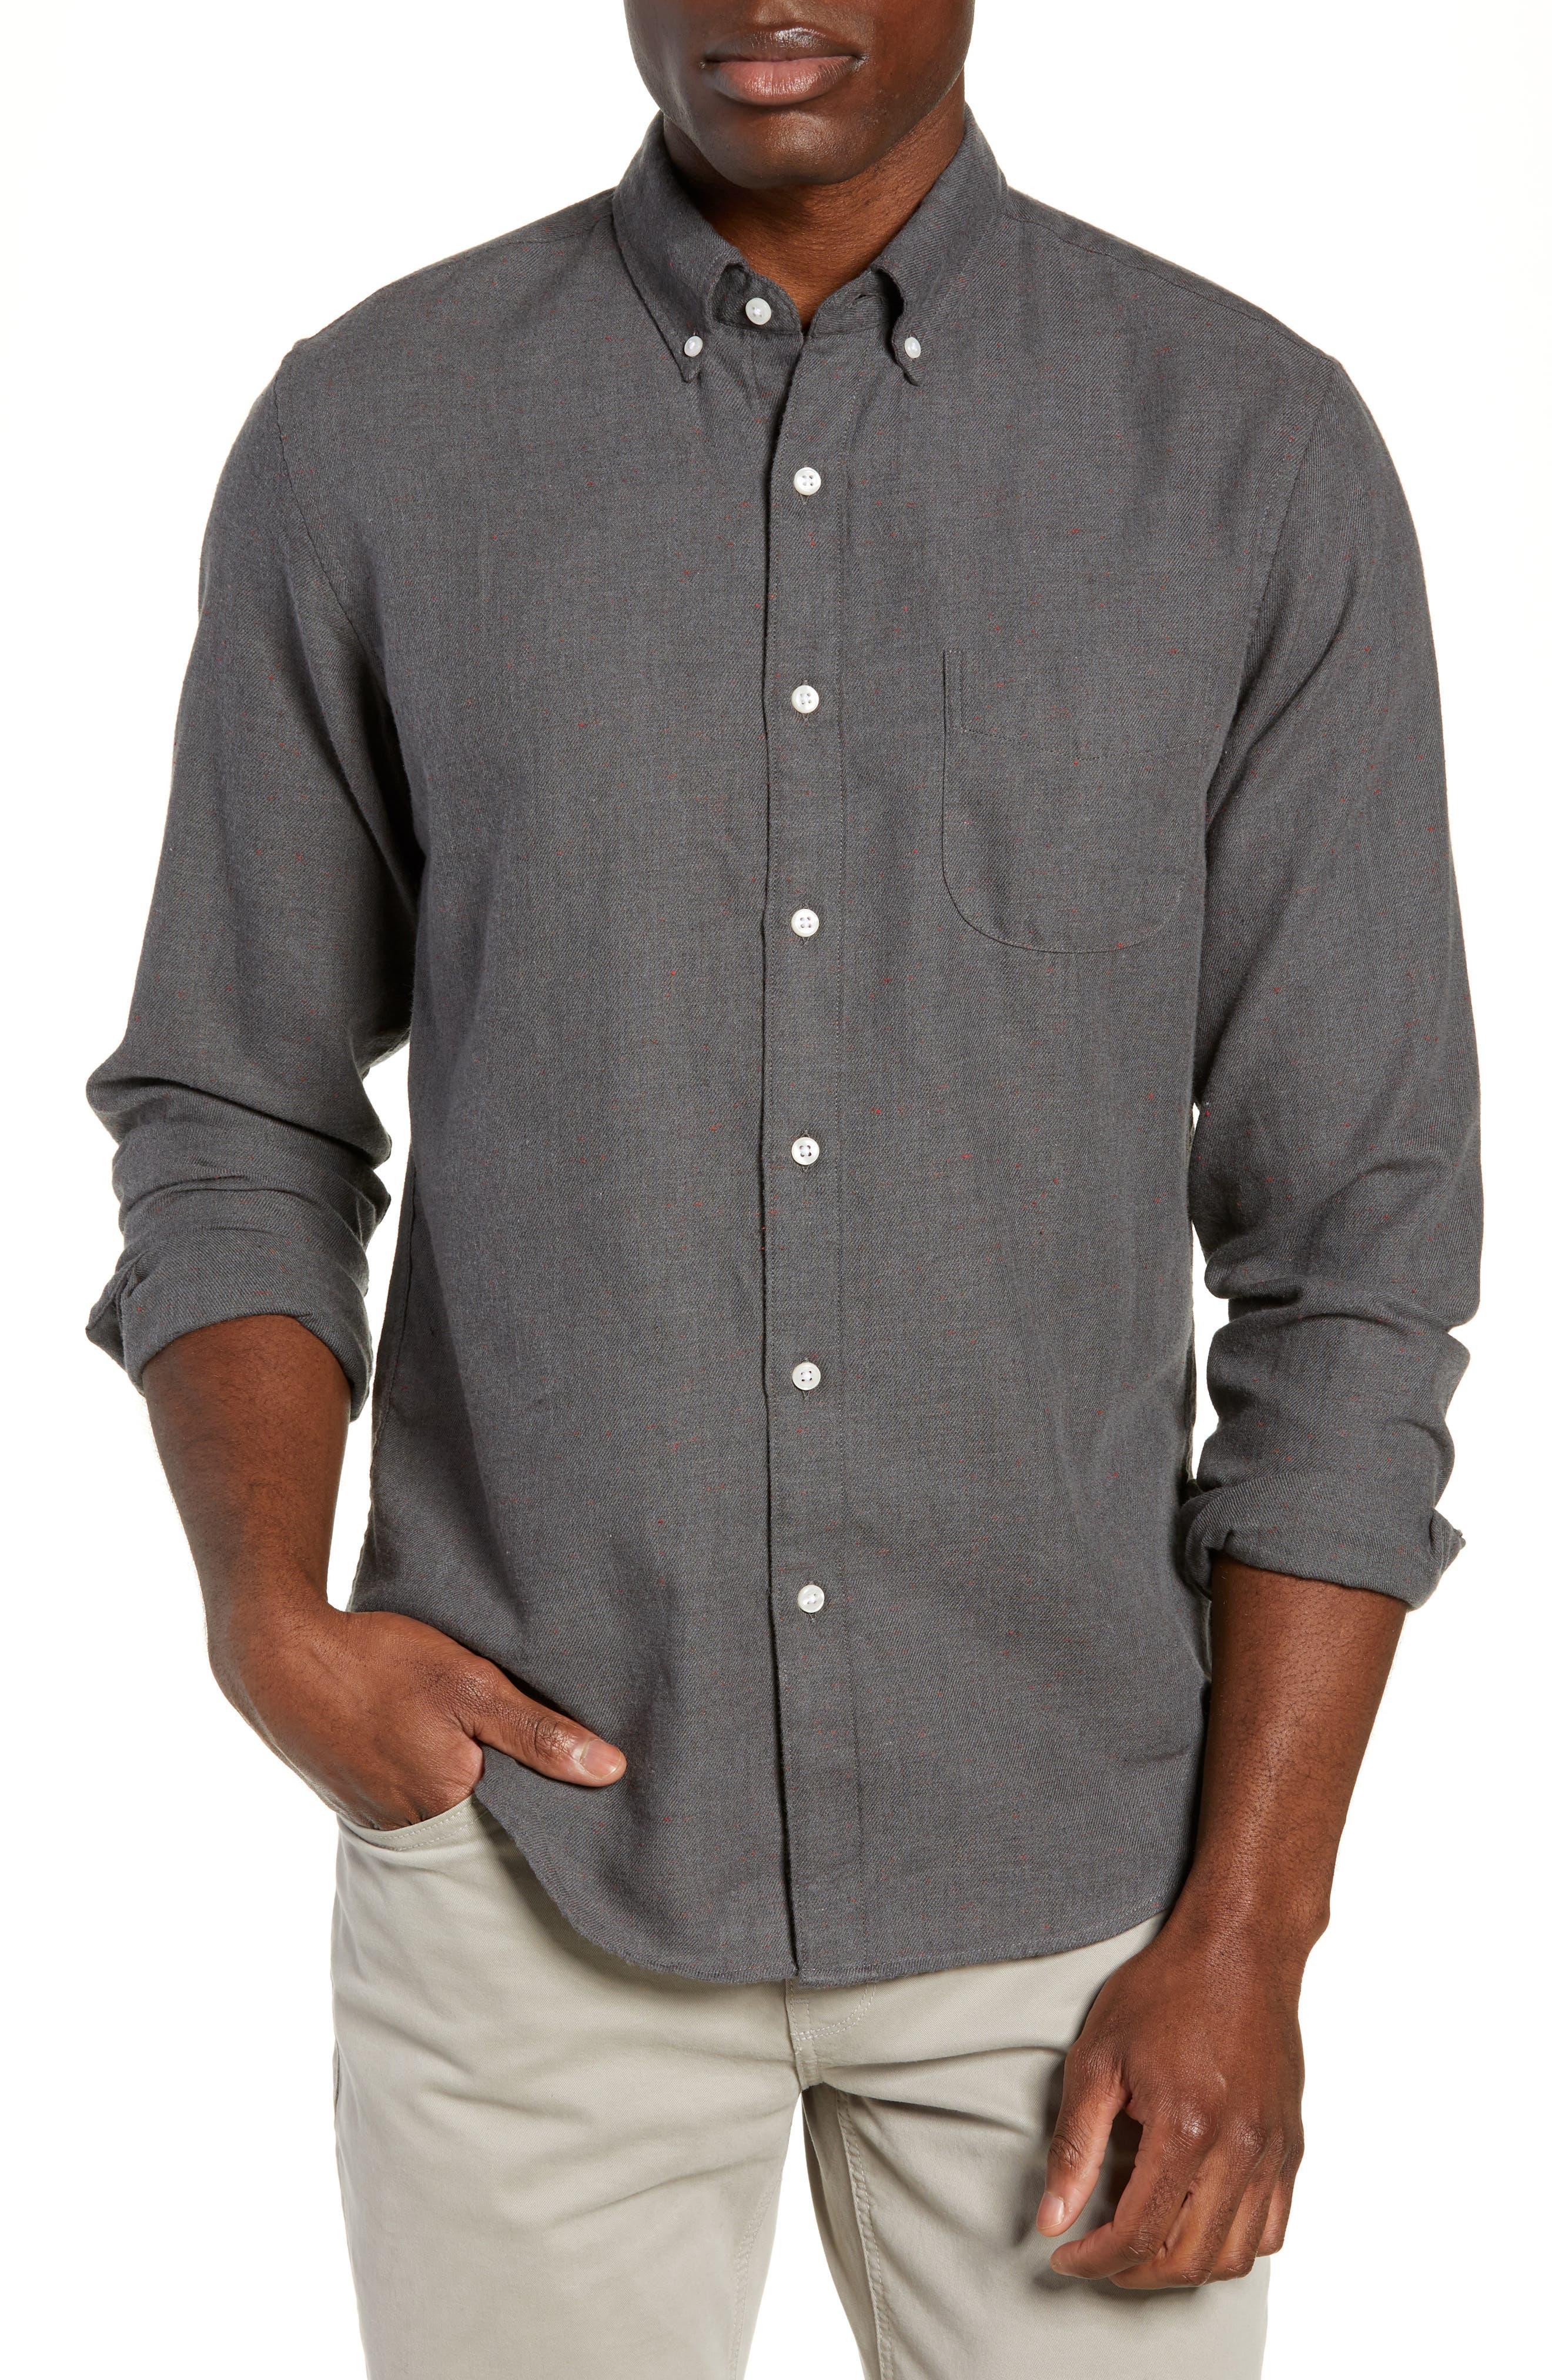 J.crew Slim Fit Neppy Twill Sport Shirt, Grey